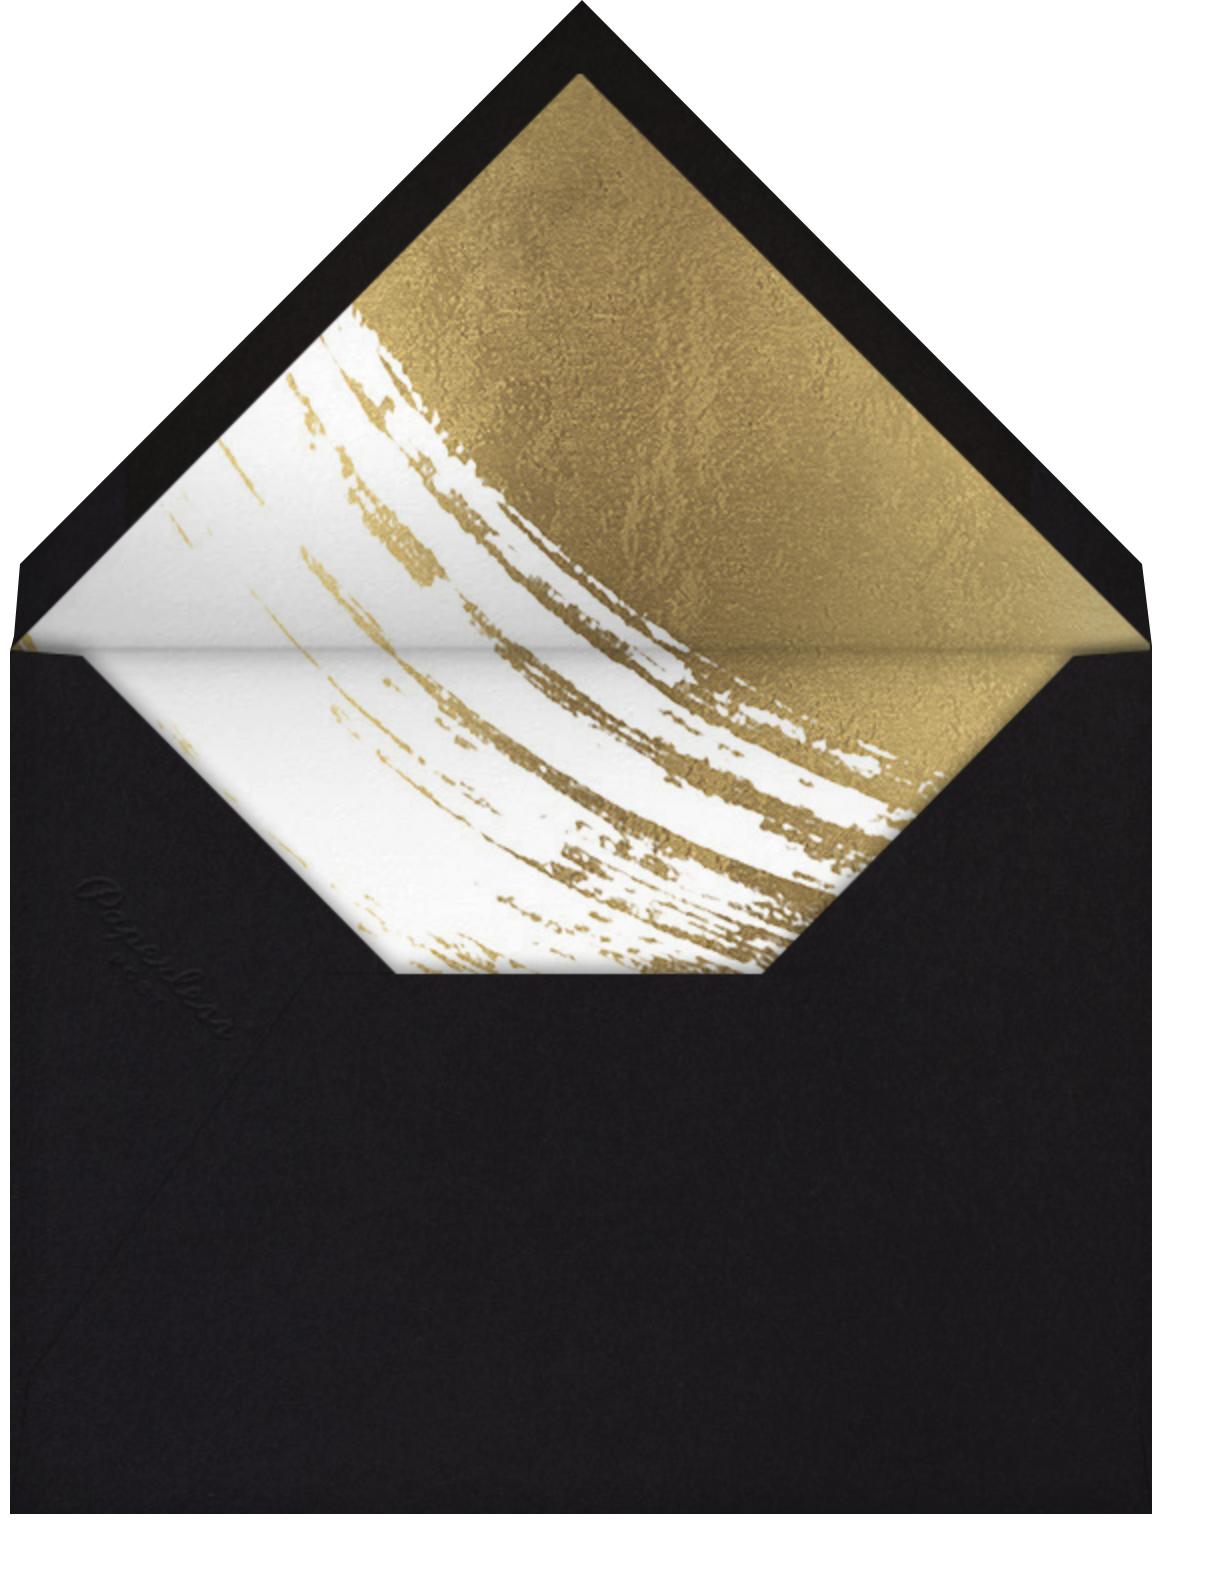 Impasto - Gold - Paperless Post - Adult birthday - envelope back